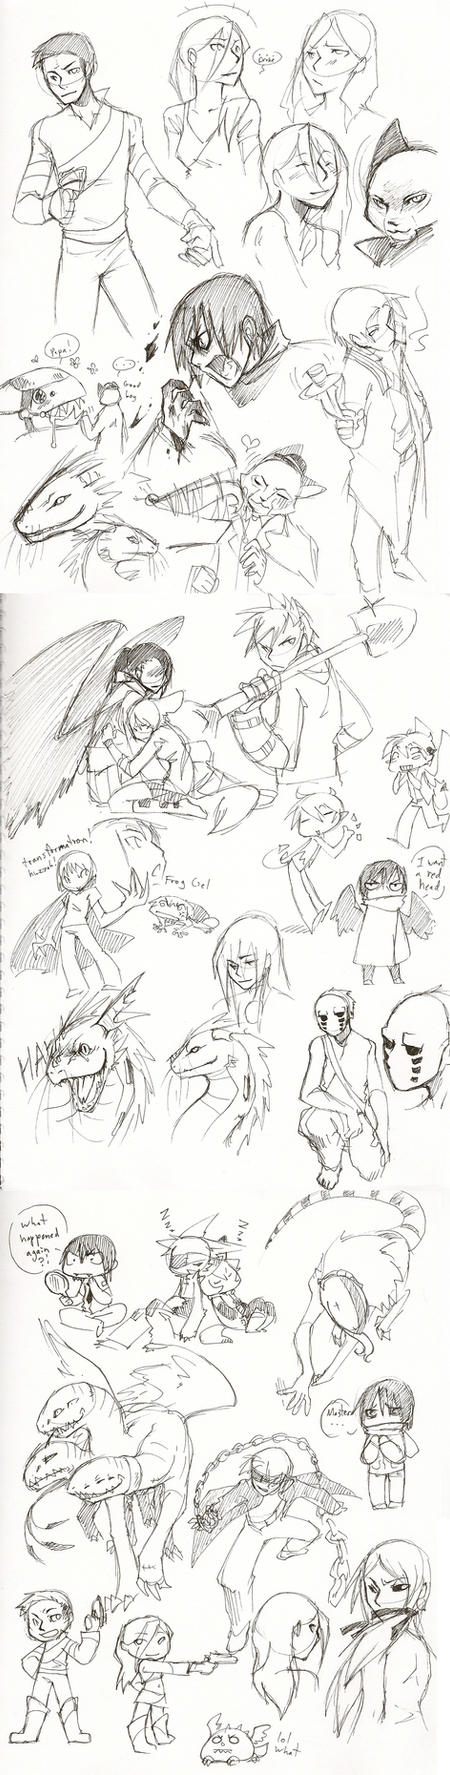 Firewind Pen Doodle Dump by Kiqo7